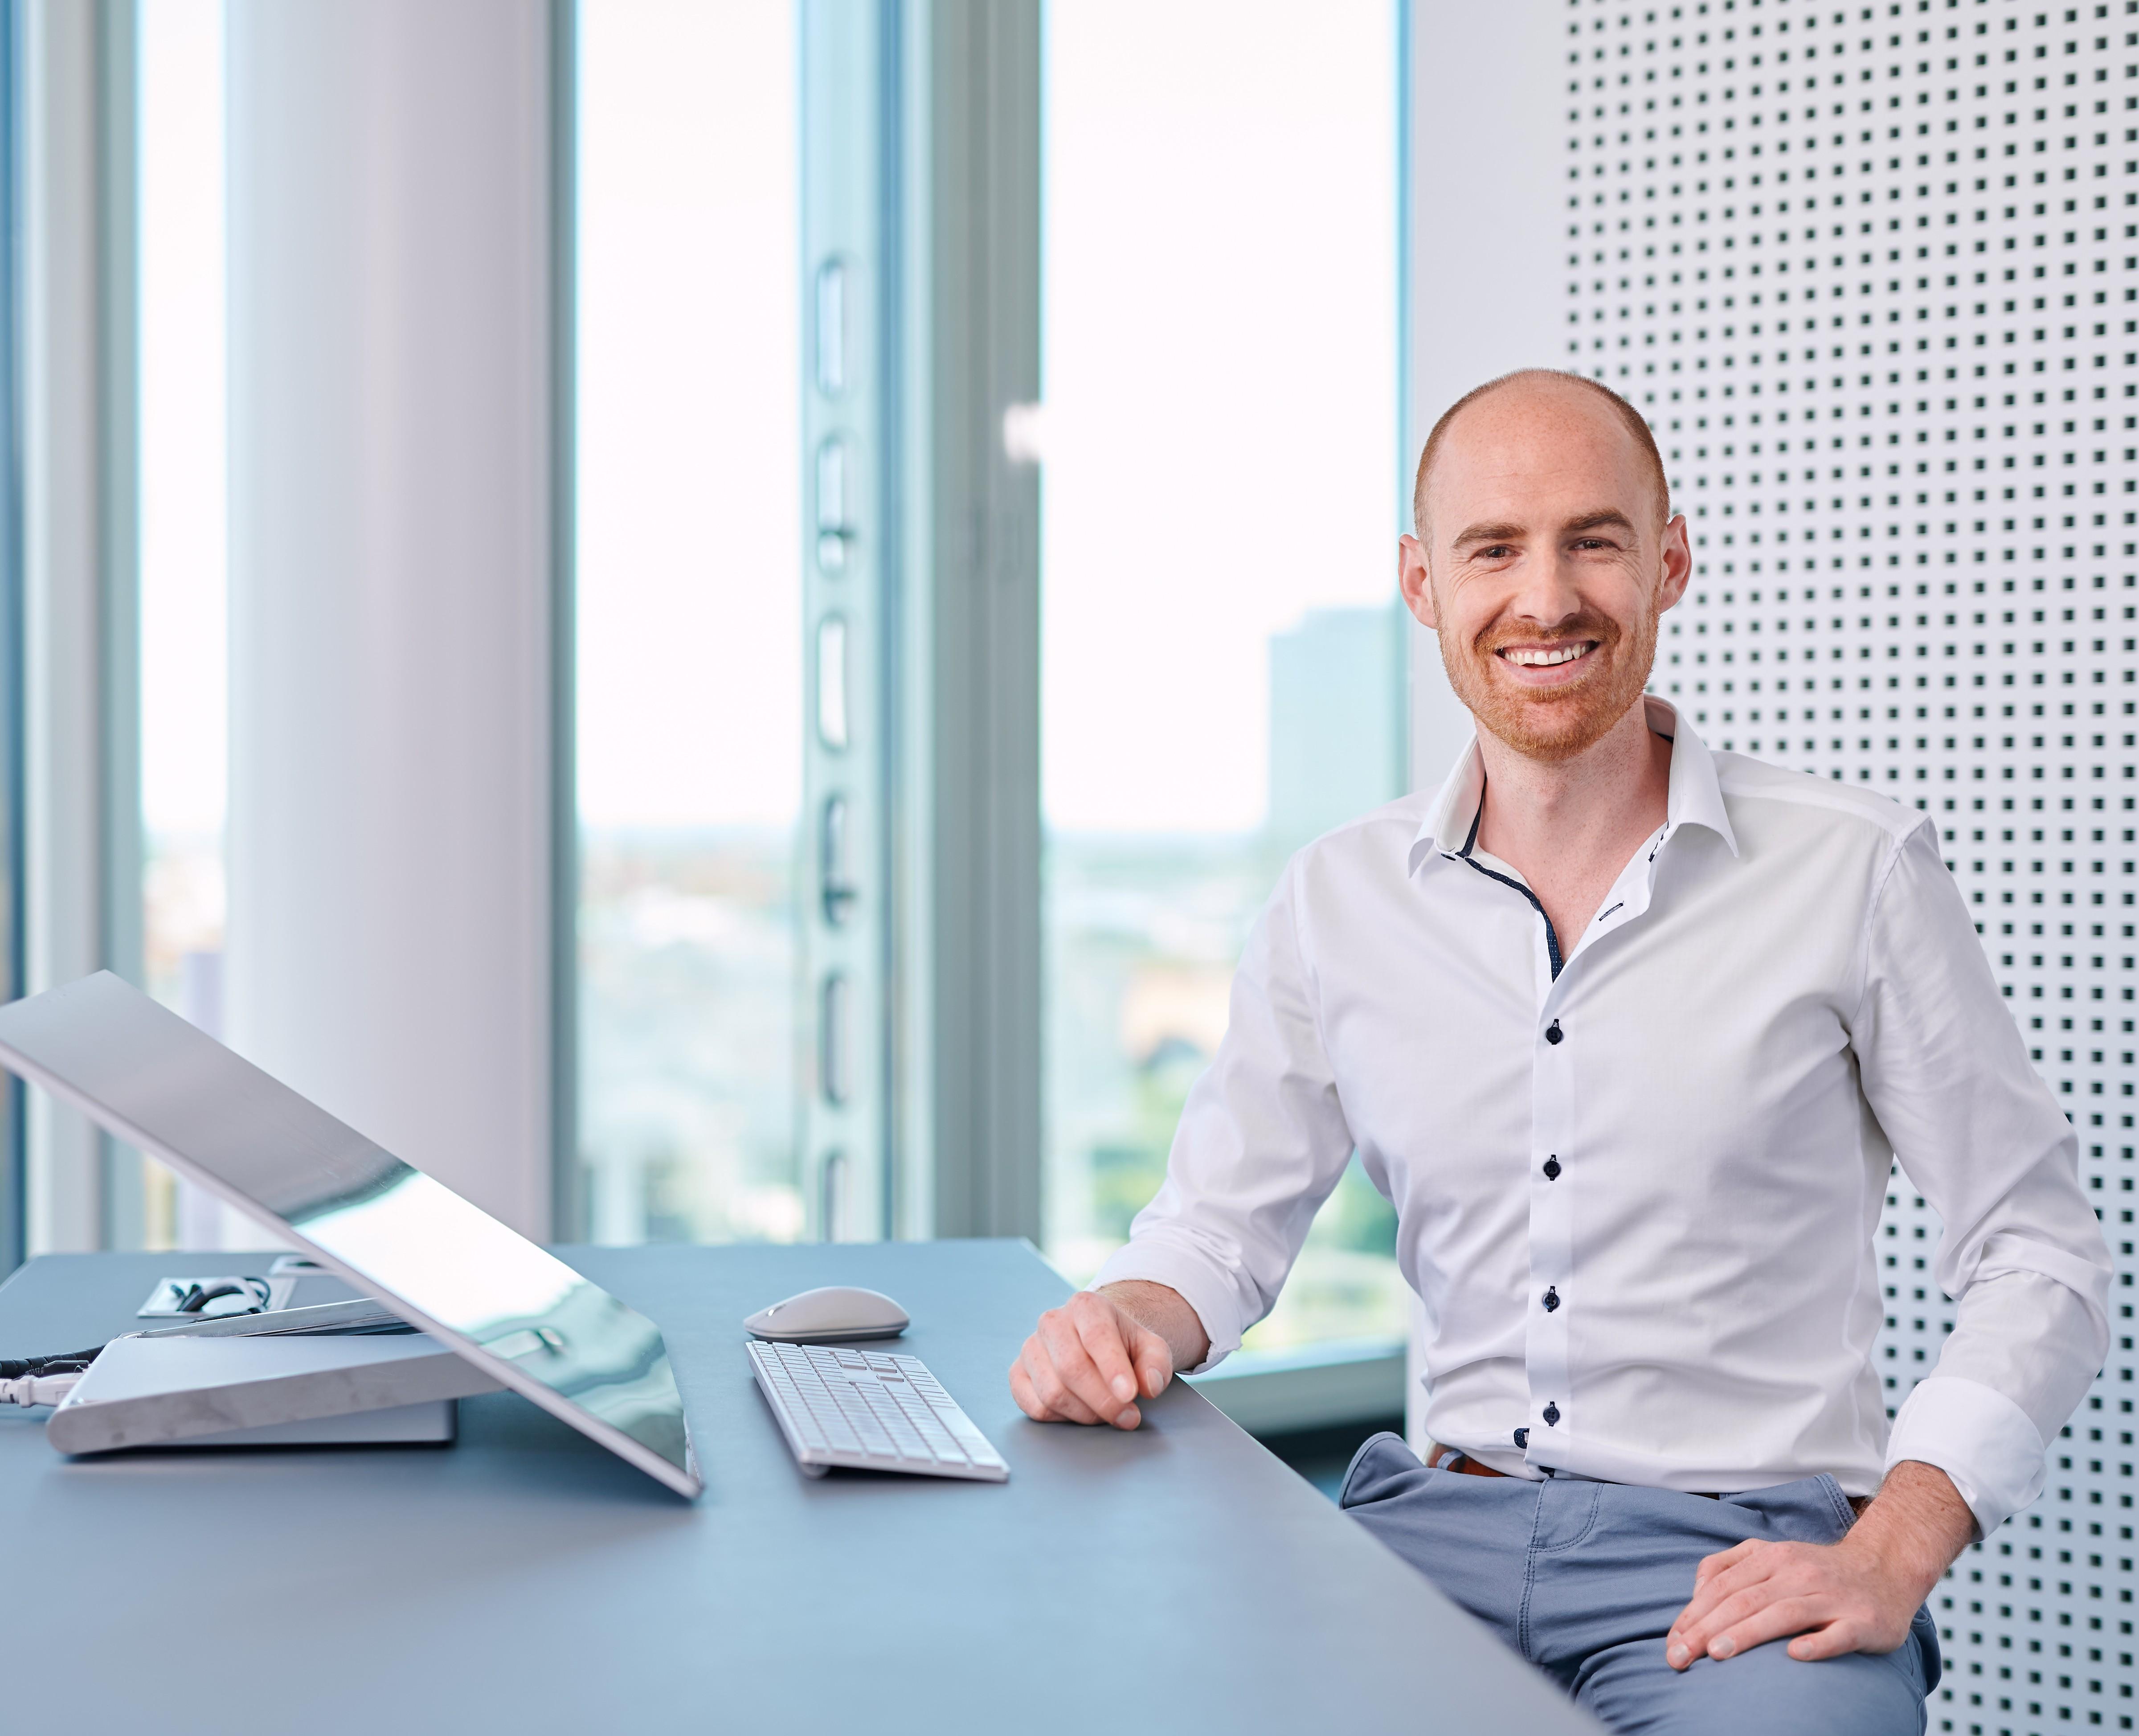 Microsoft software implementation expert